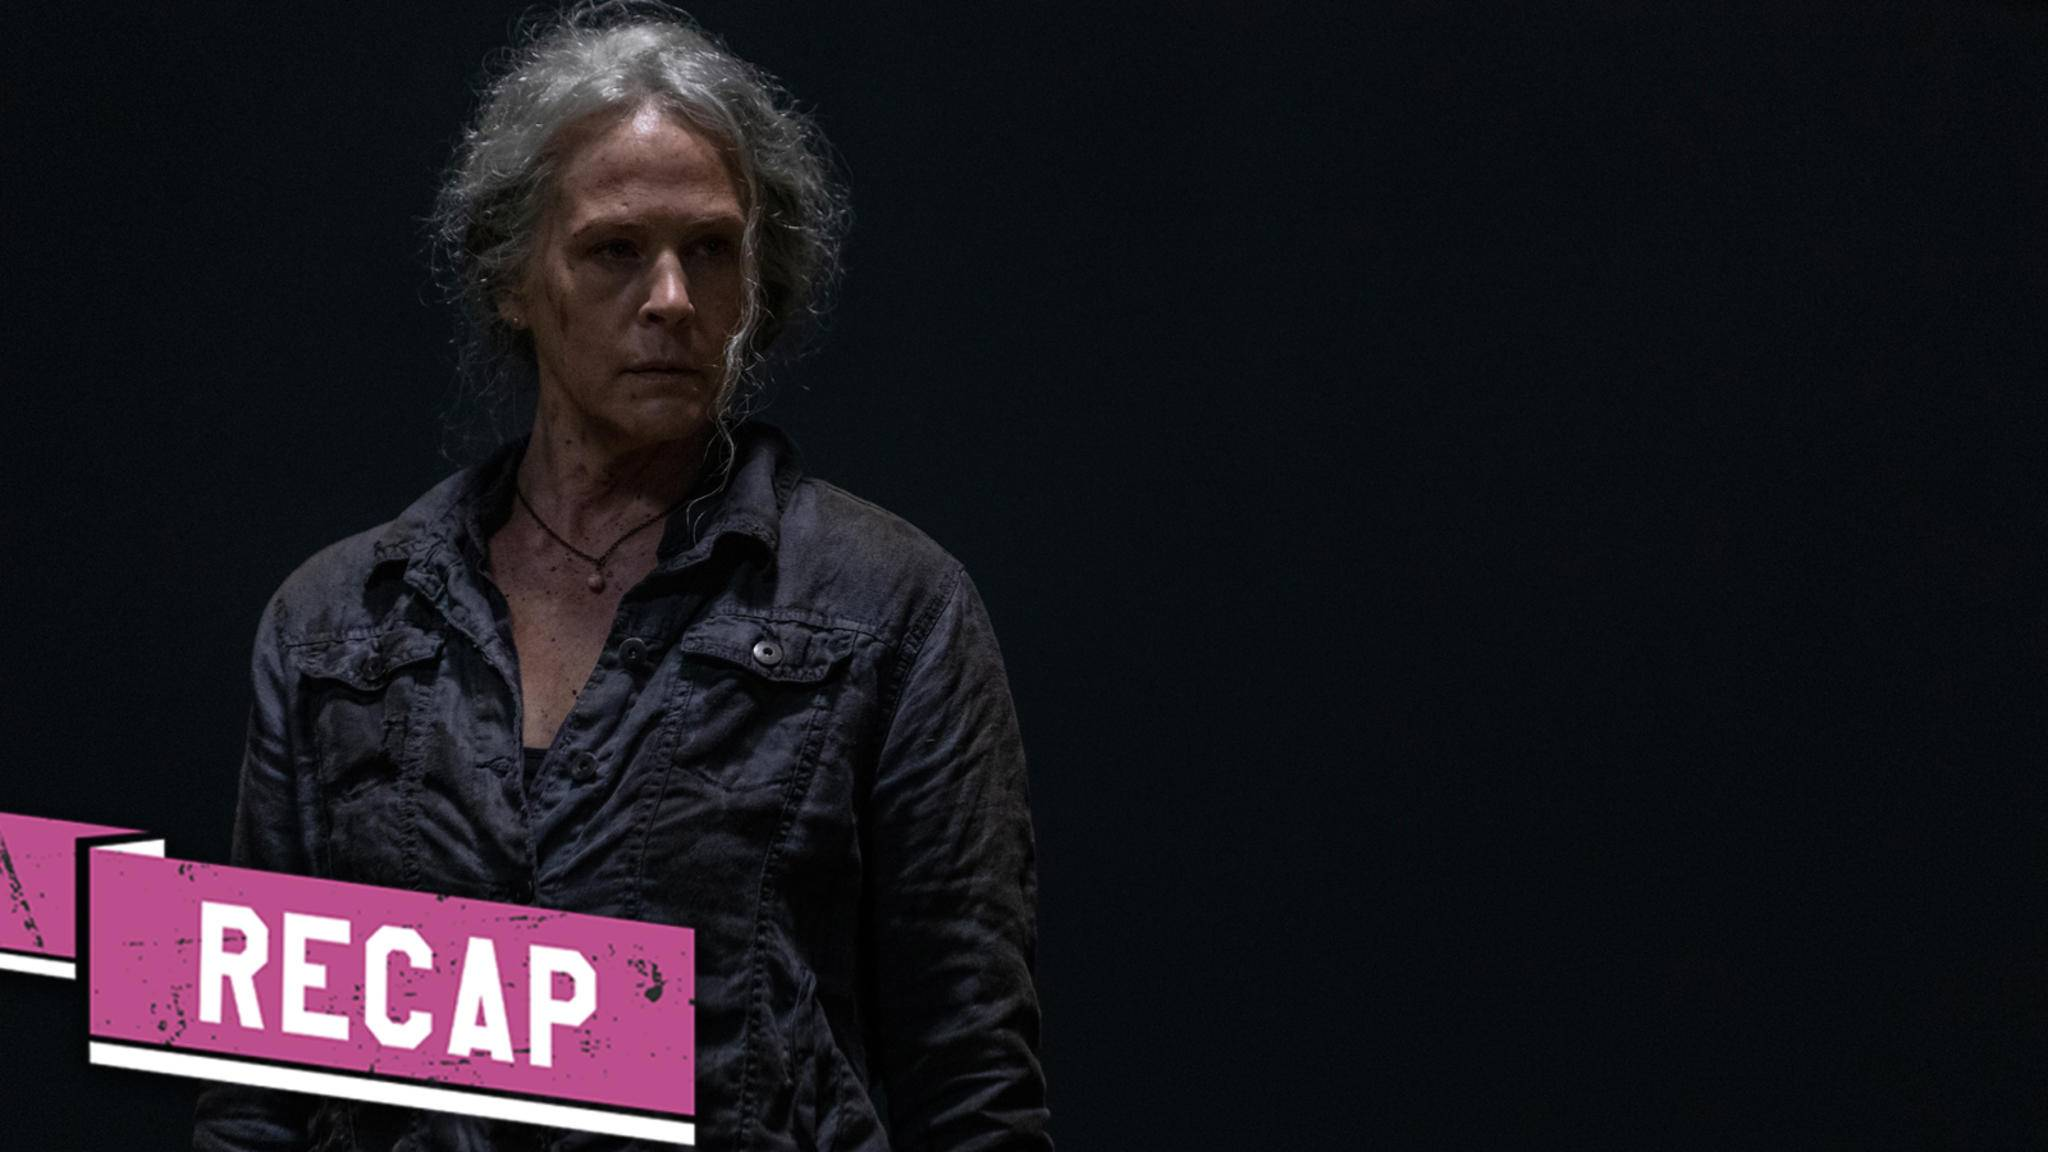 The-Walking-Dead-S10E03-Carol-Jackson-Lee-Davis-AMC-Teaserbild